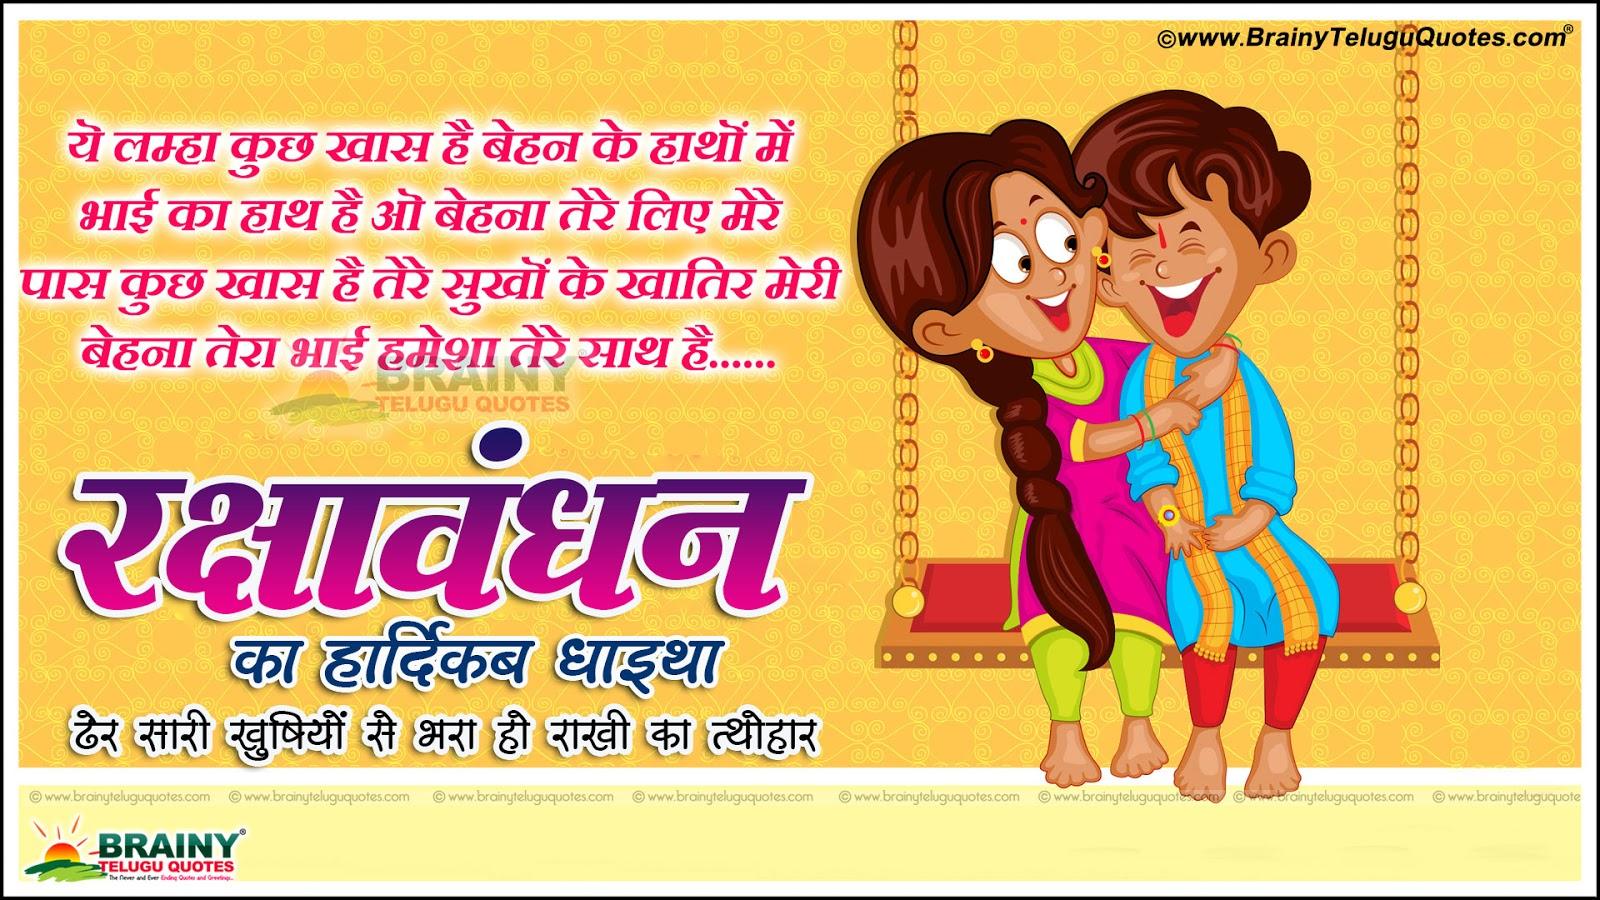 Latest 2016 rakshan bandhan wishes sms in hindi brainyteluguquotes rakshan bandhan hindi nice quotes and shayari images for sister top rakshan bandhan wishes wallpapers rakshan bandhan hindi greetings images nice rakshan m4hsunfo